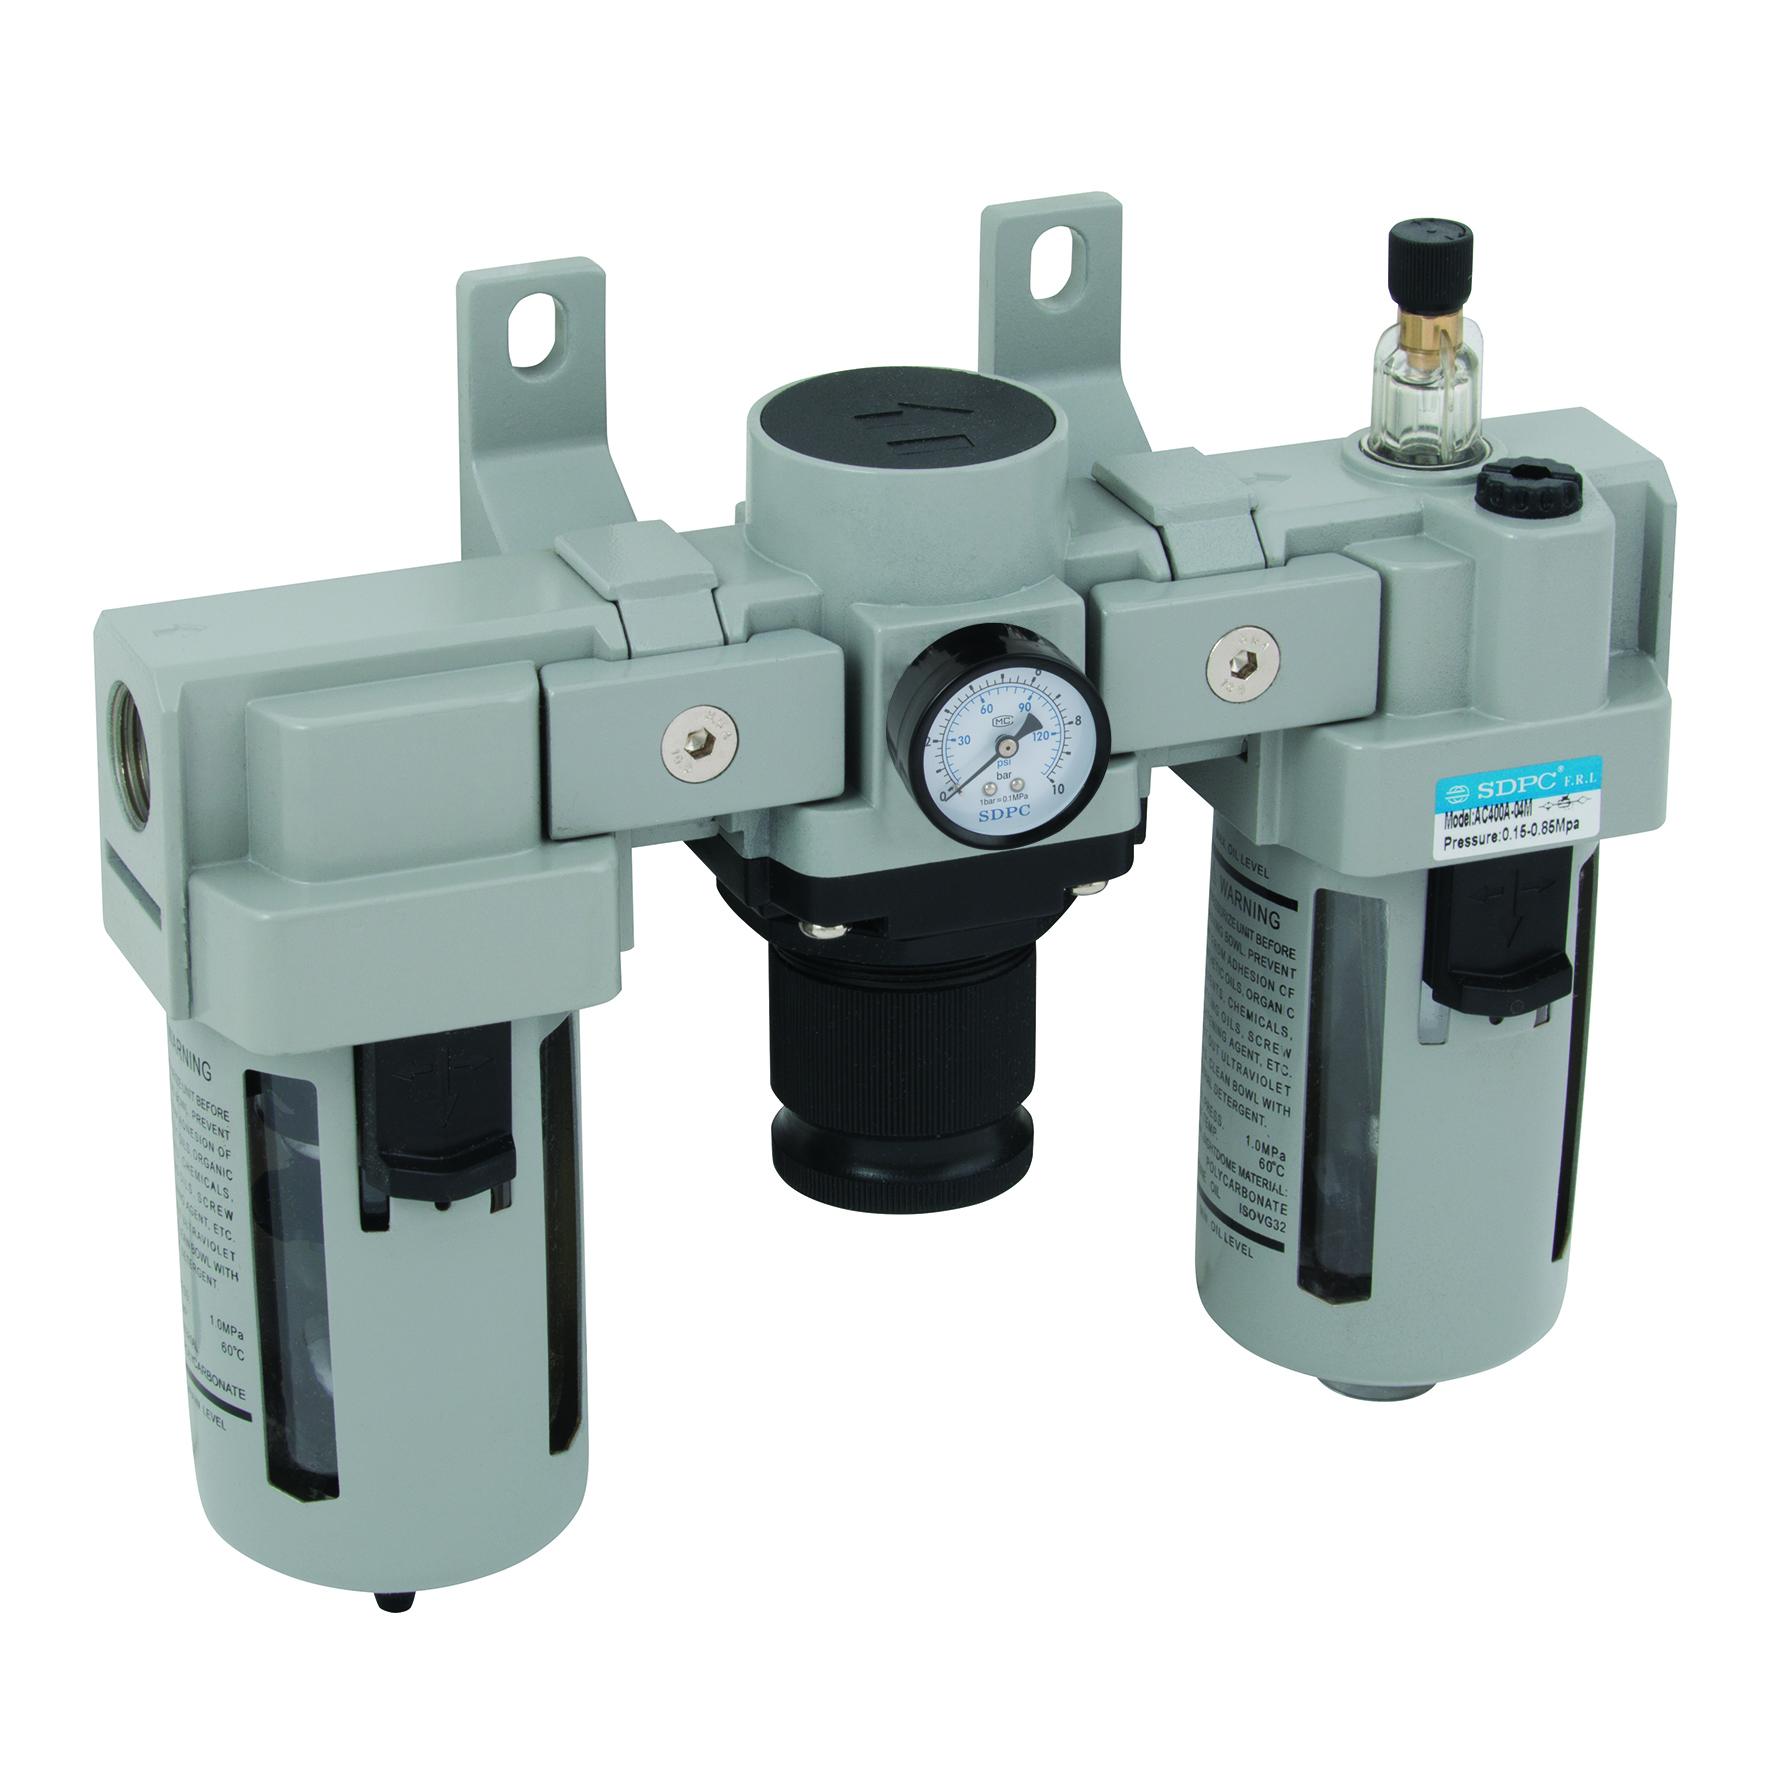 filters-regulators-lubricators